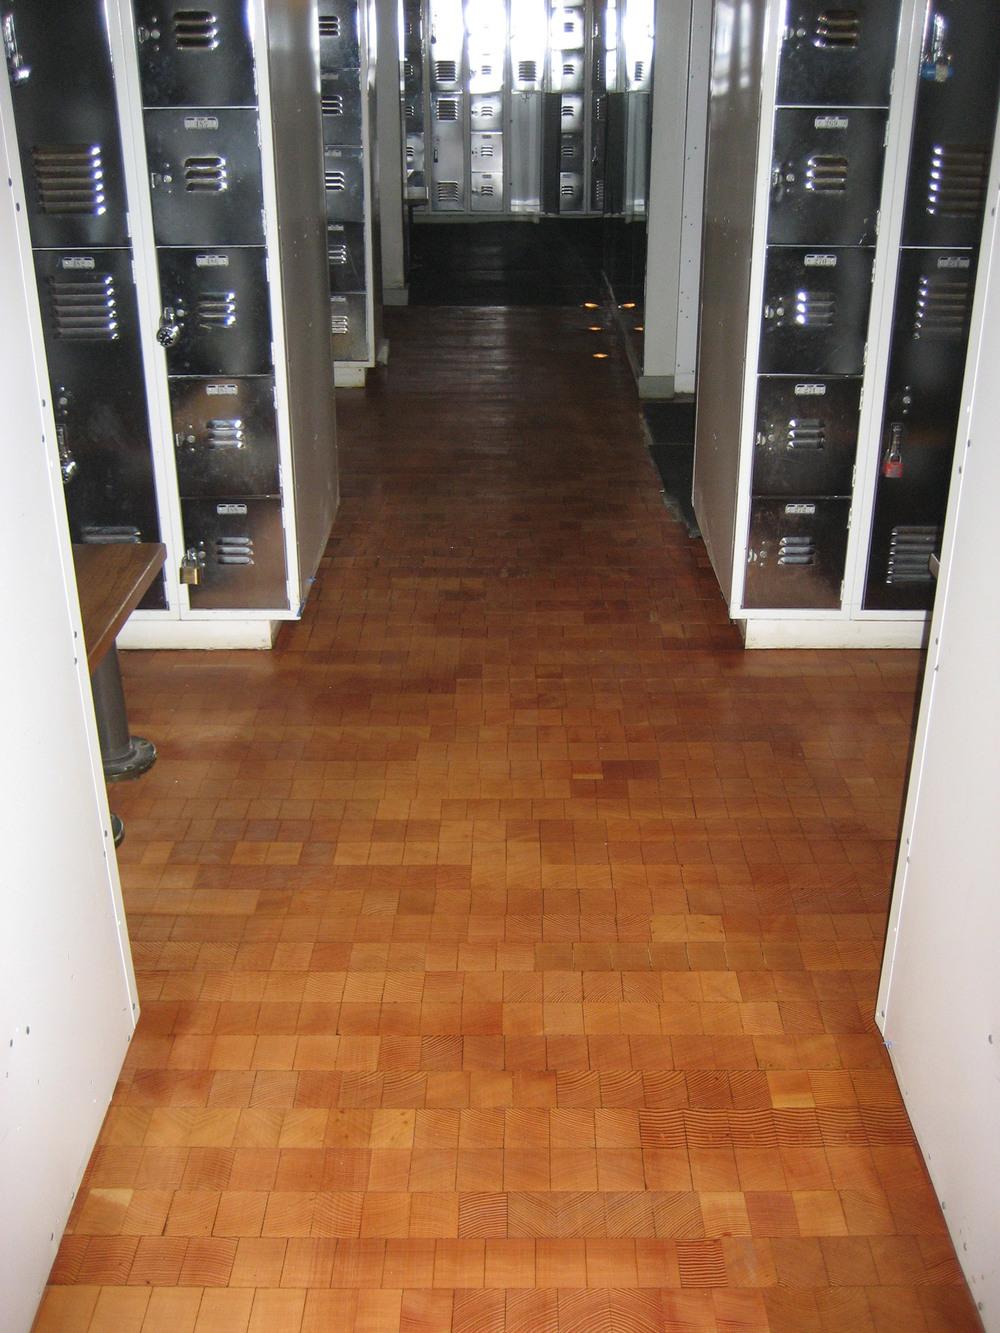 after-locker-room-1-UES-gym-b2.jpg